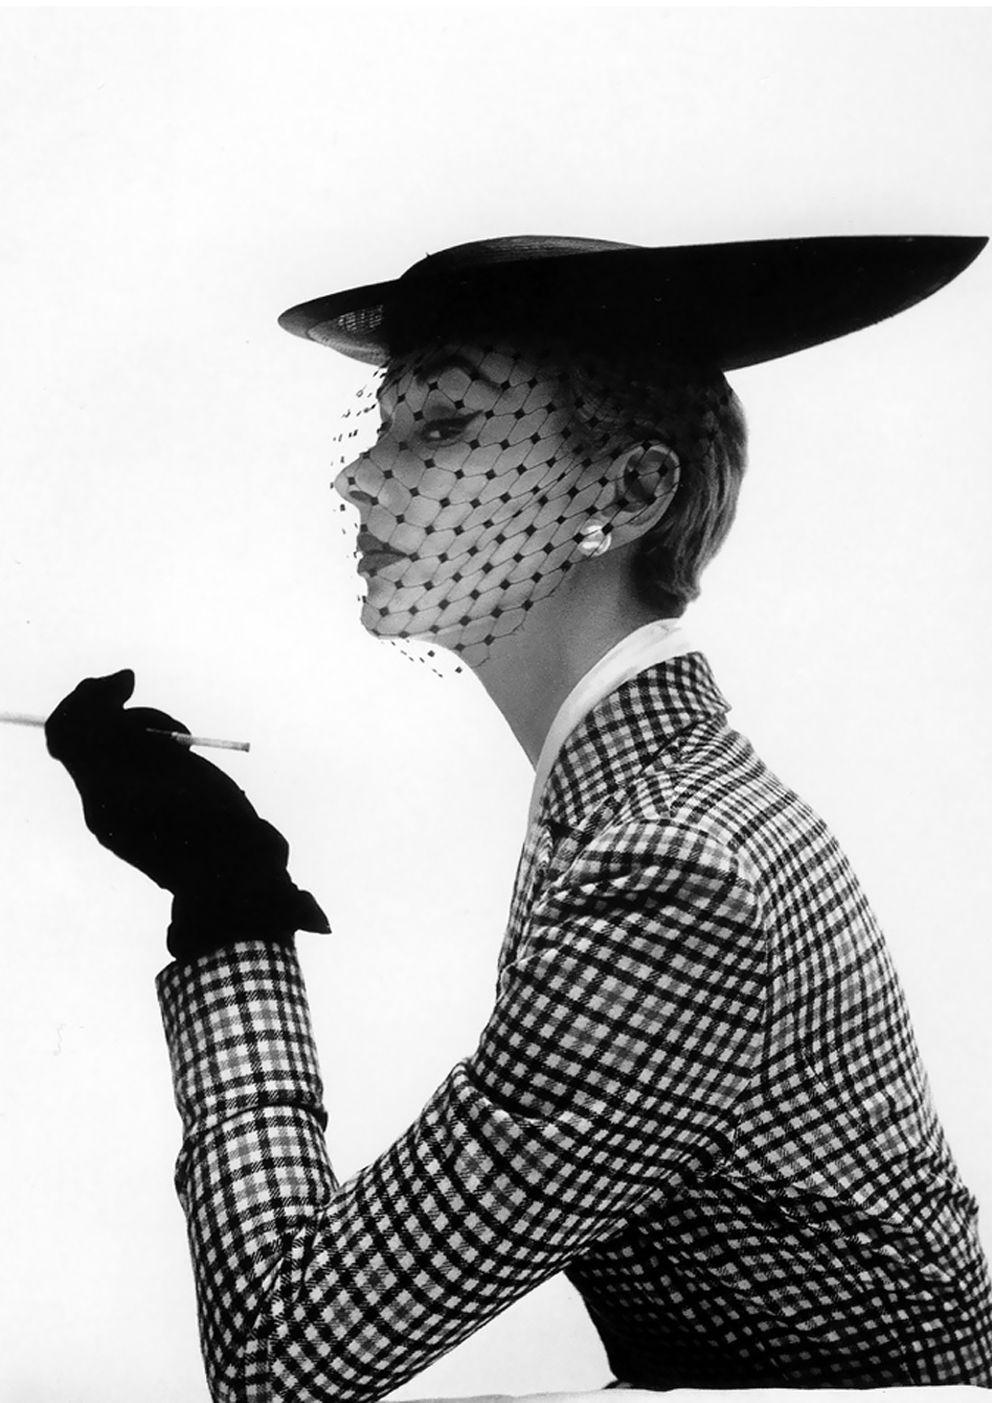 84bda2e16aa Lissa Fonssagrives wearing a hat by Lilly Dache